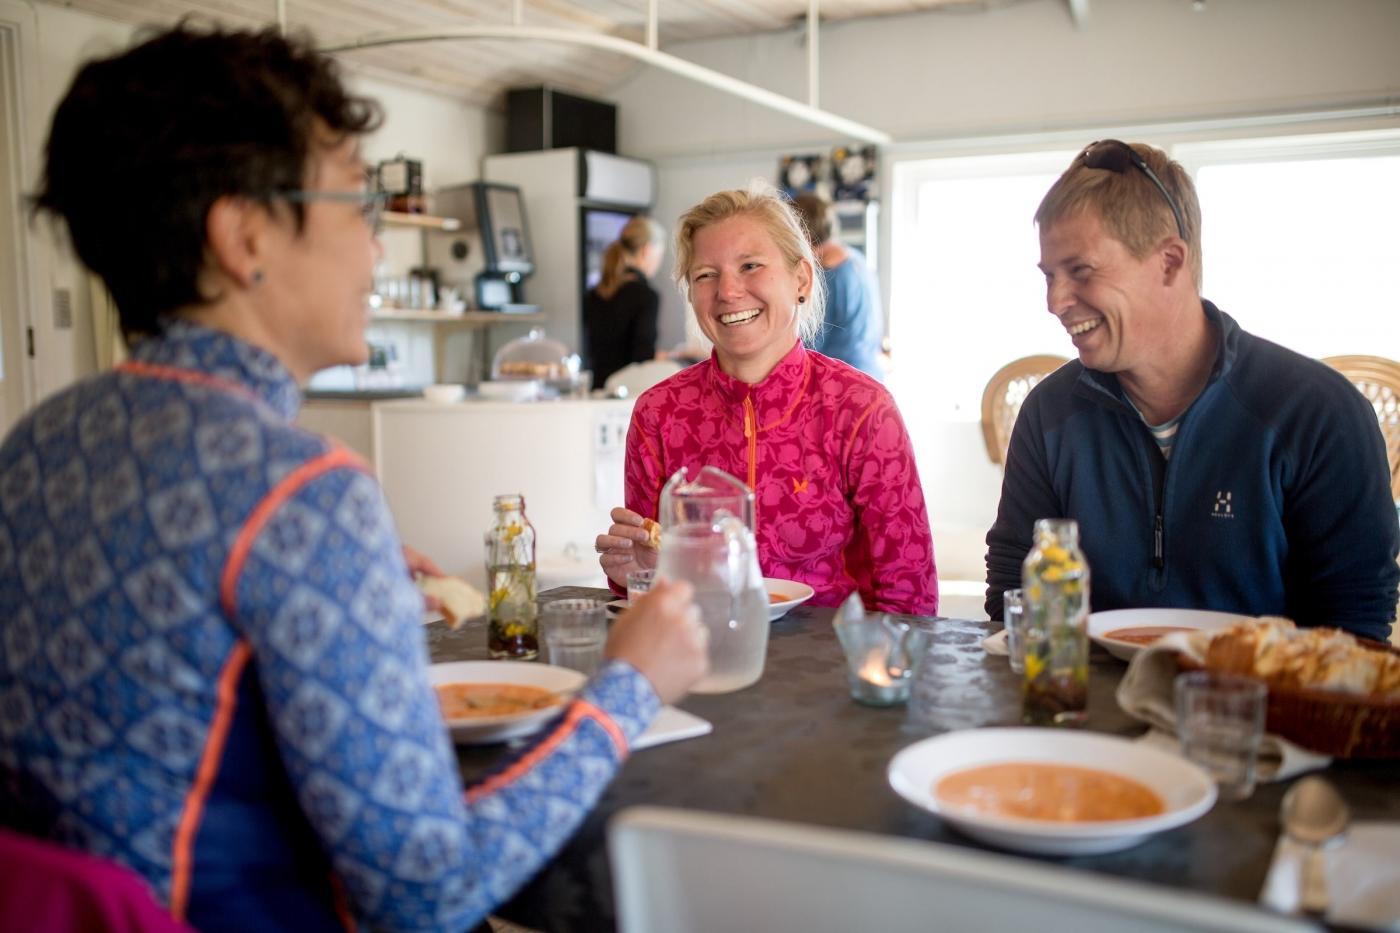 Guests at Igaliku Country Hotel having dinner. Photo by Mads Pihl - Visit Greenland